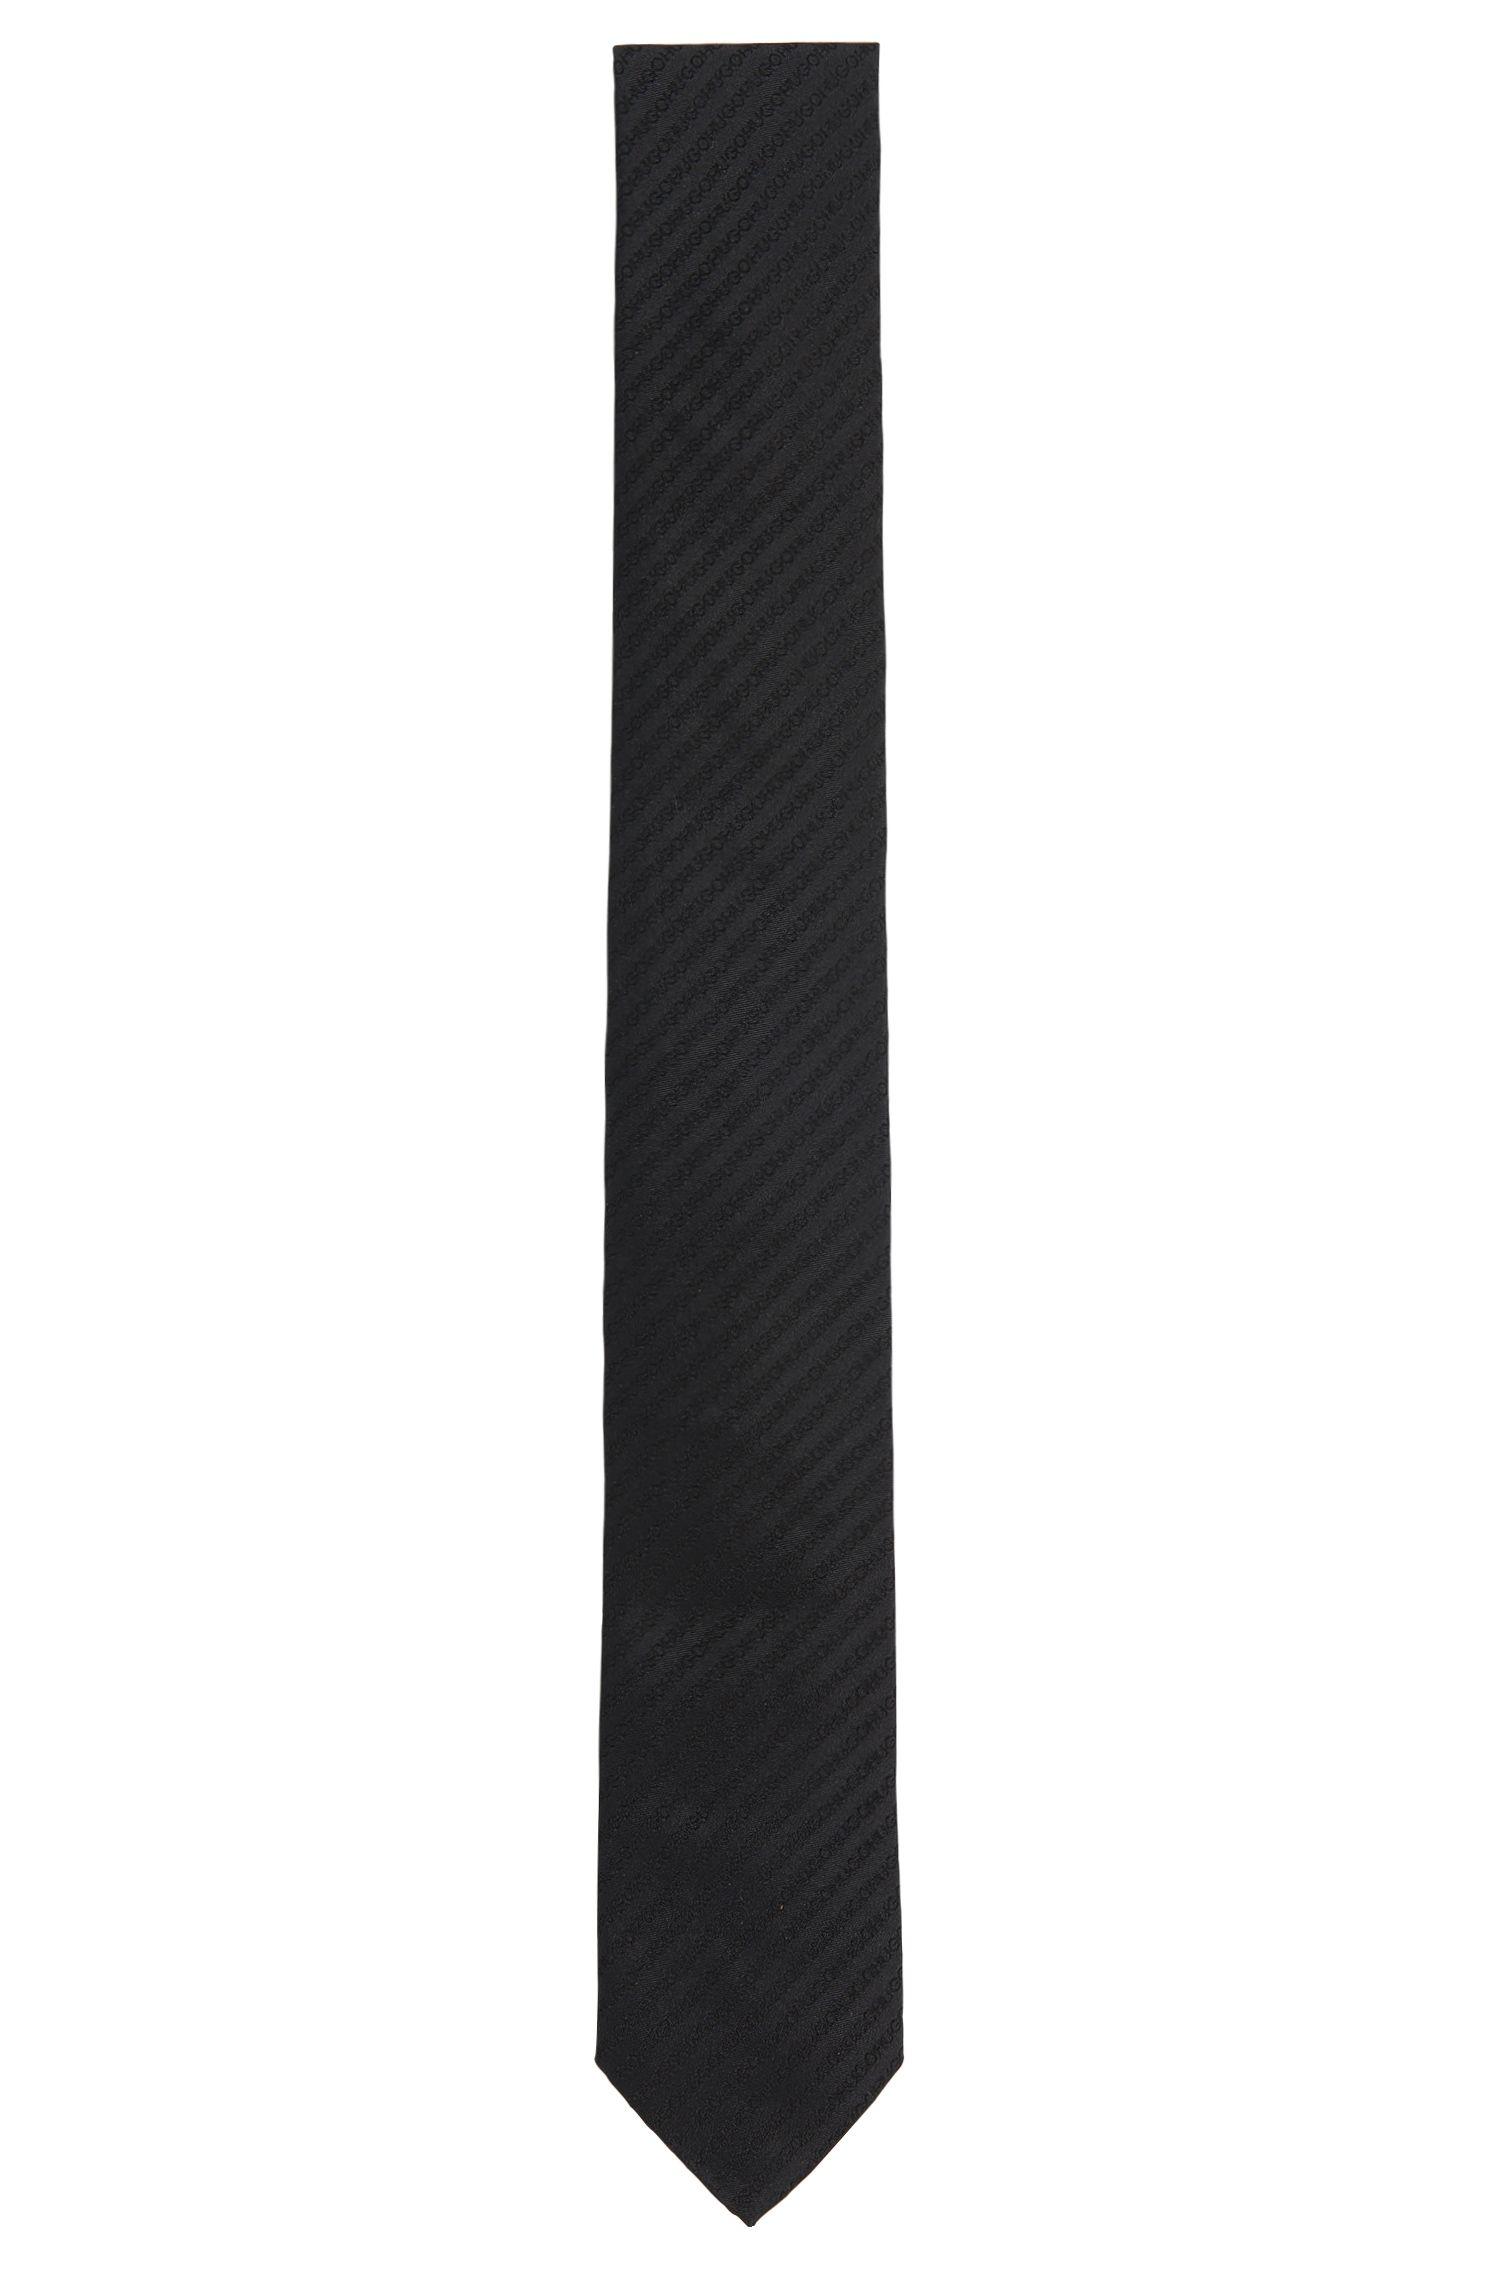 Corbata de seda con logos bordados: 'Tie cm 6'